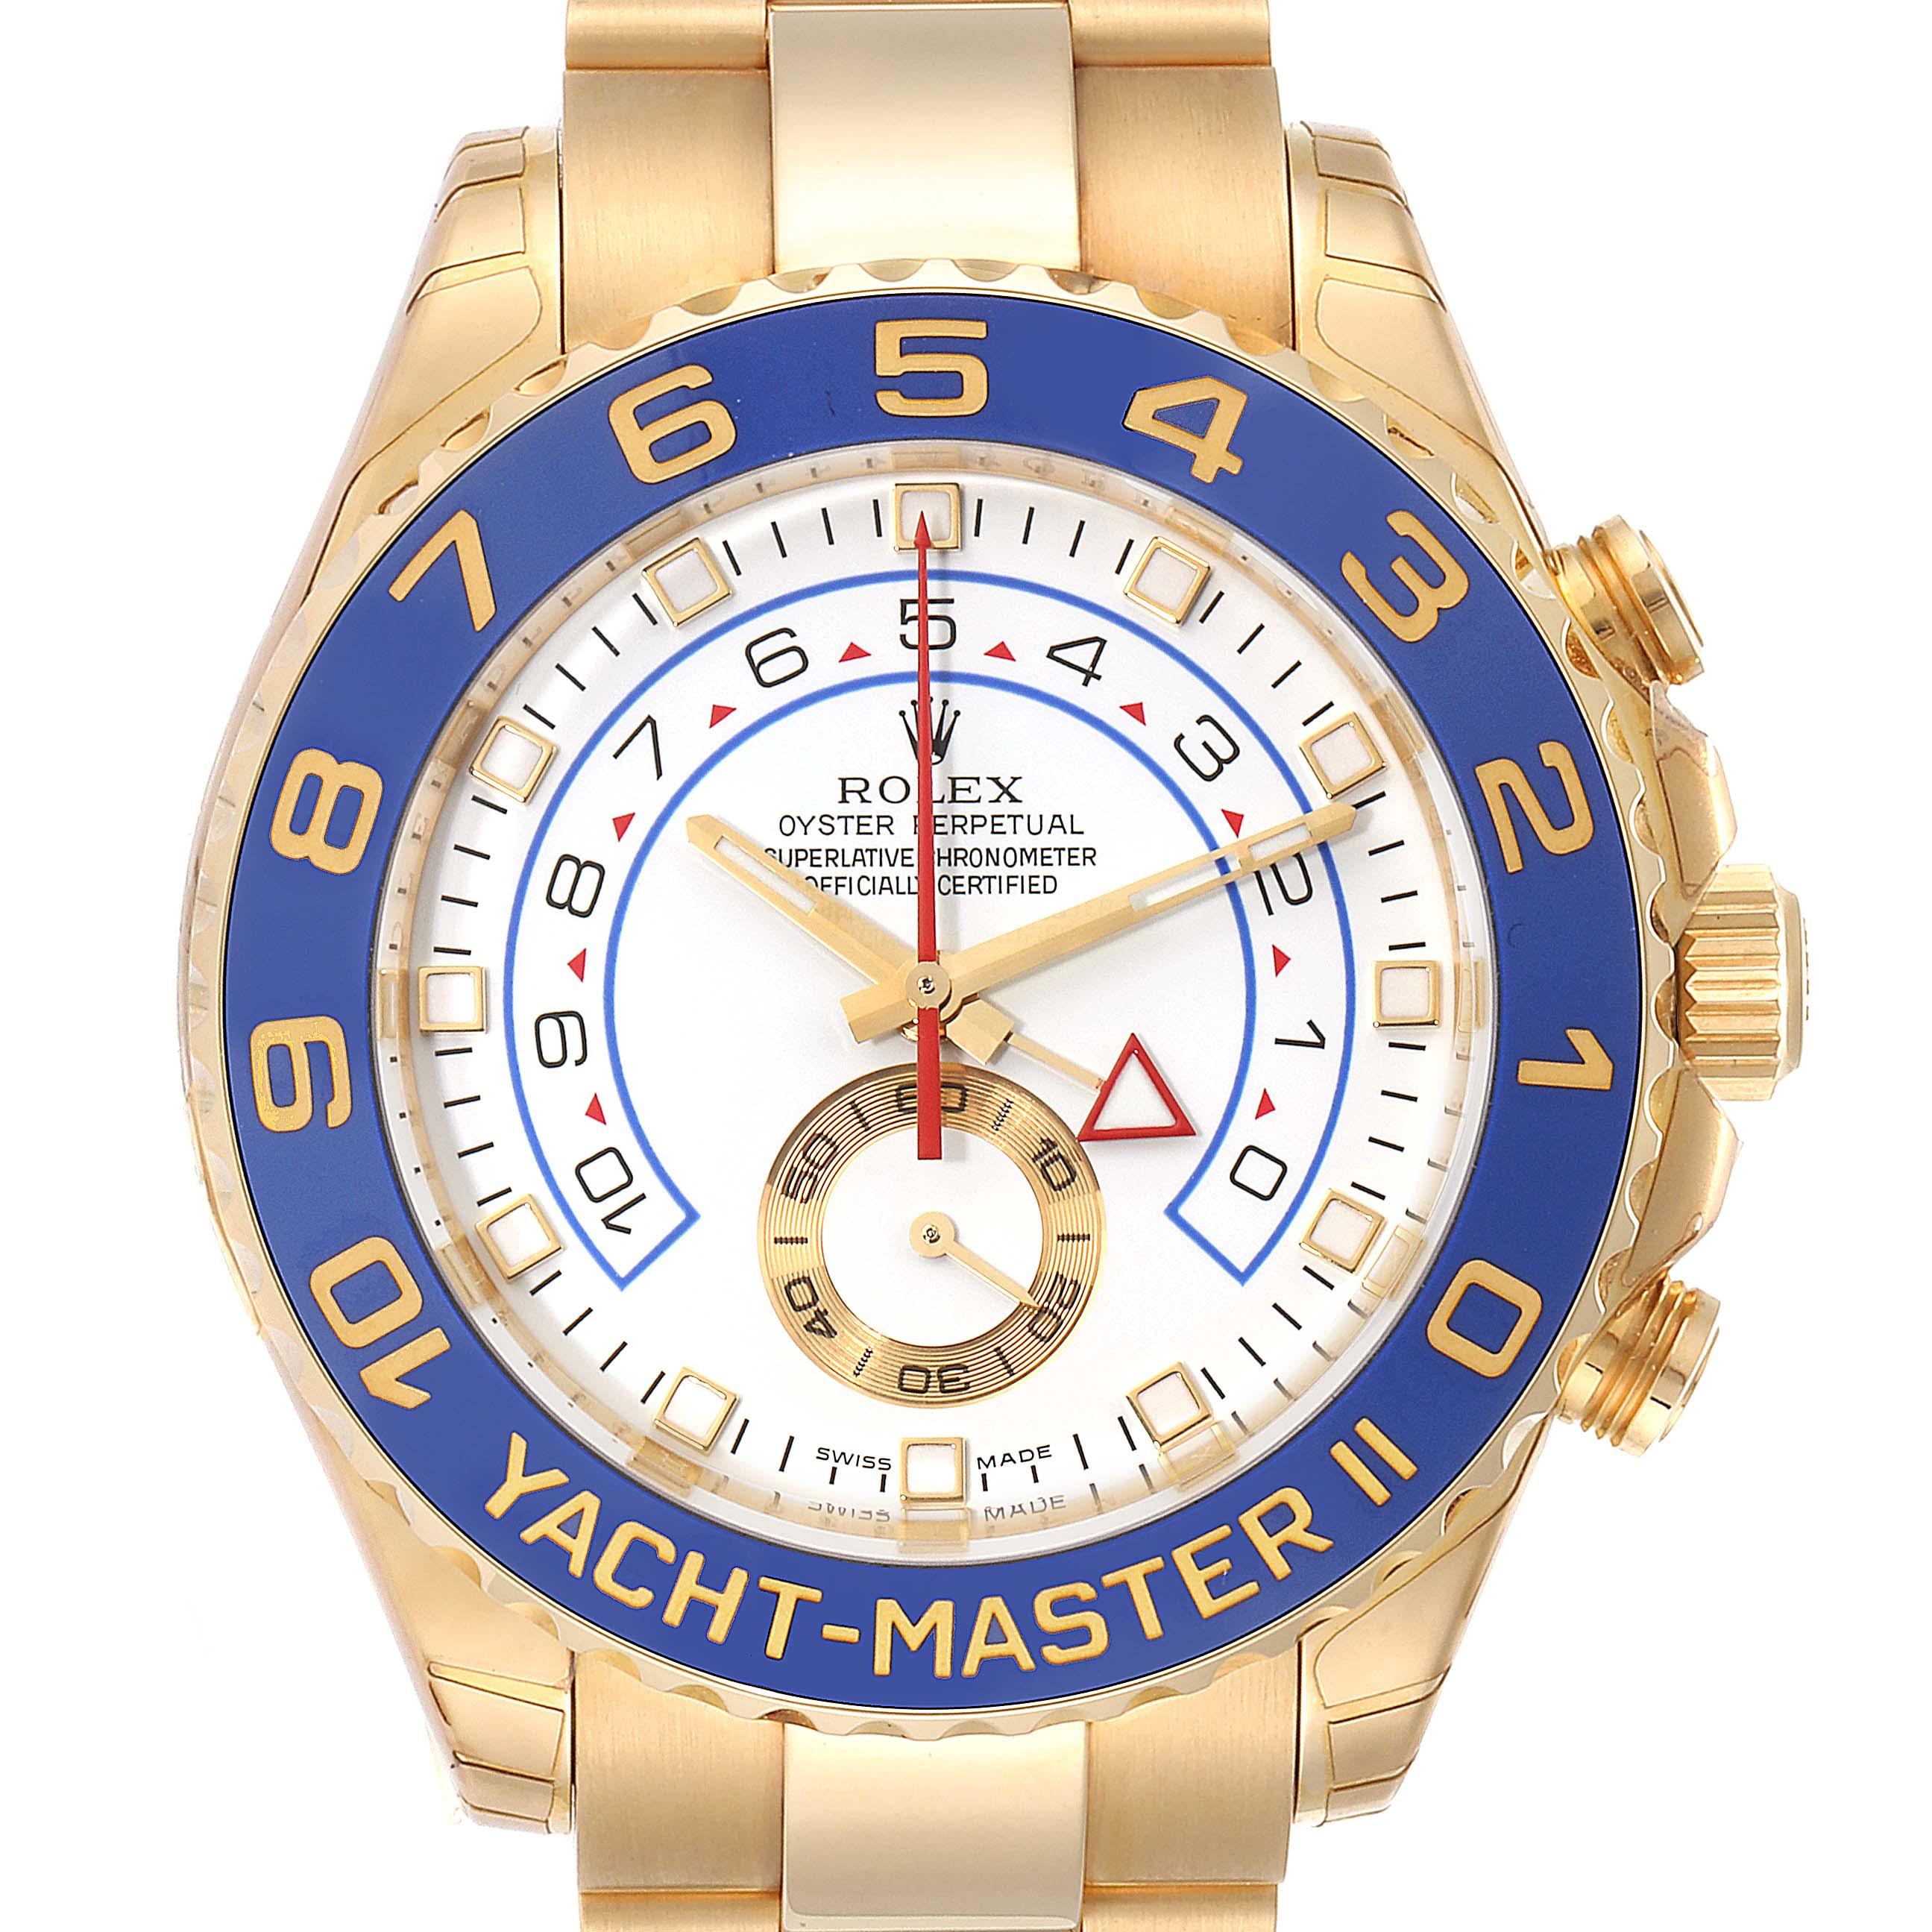 Photo of Rolex Yachtmaster II Regatta Chronograph Yellow Gold Watch 116688 Unworn